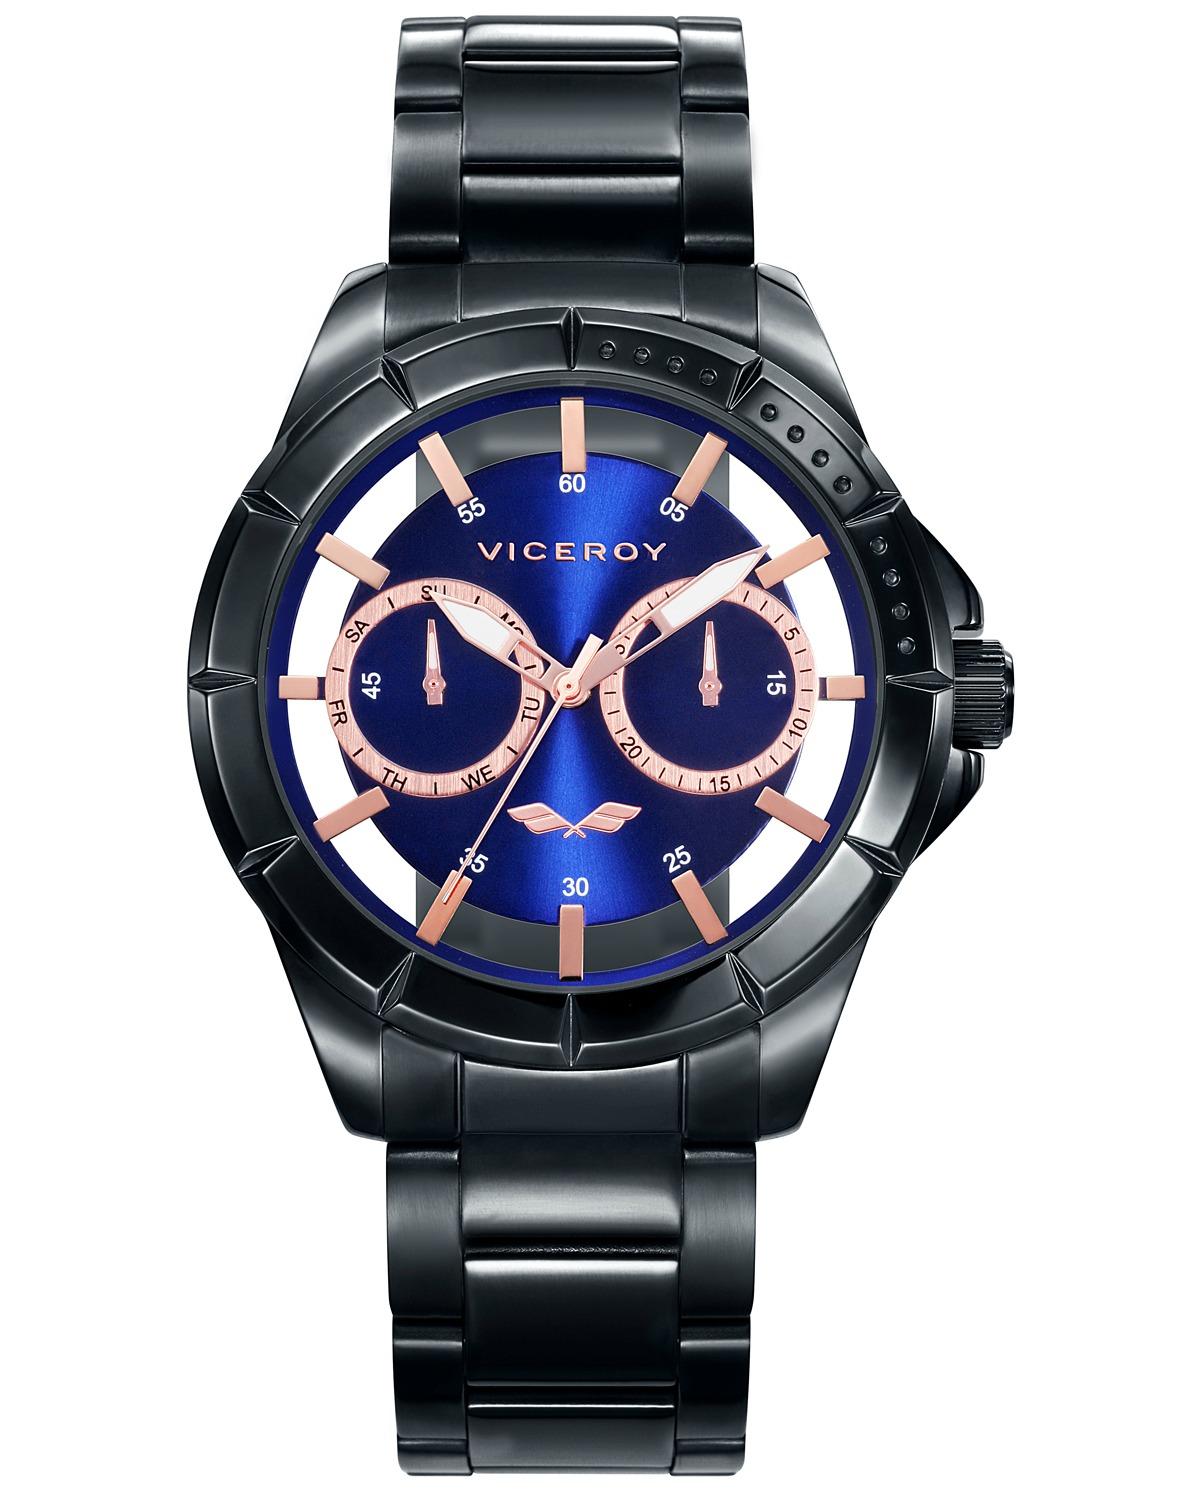 Viceroy Hombre - 139€